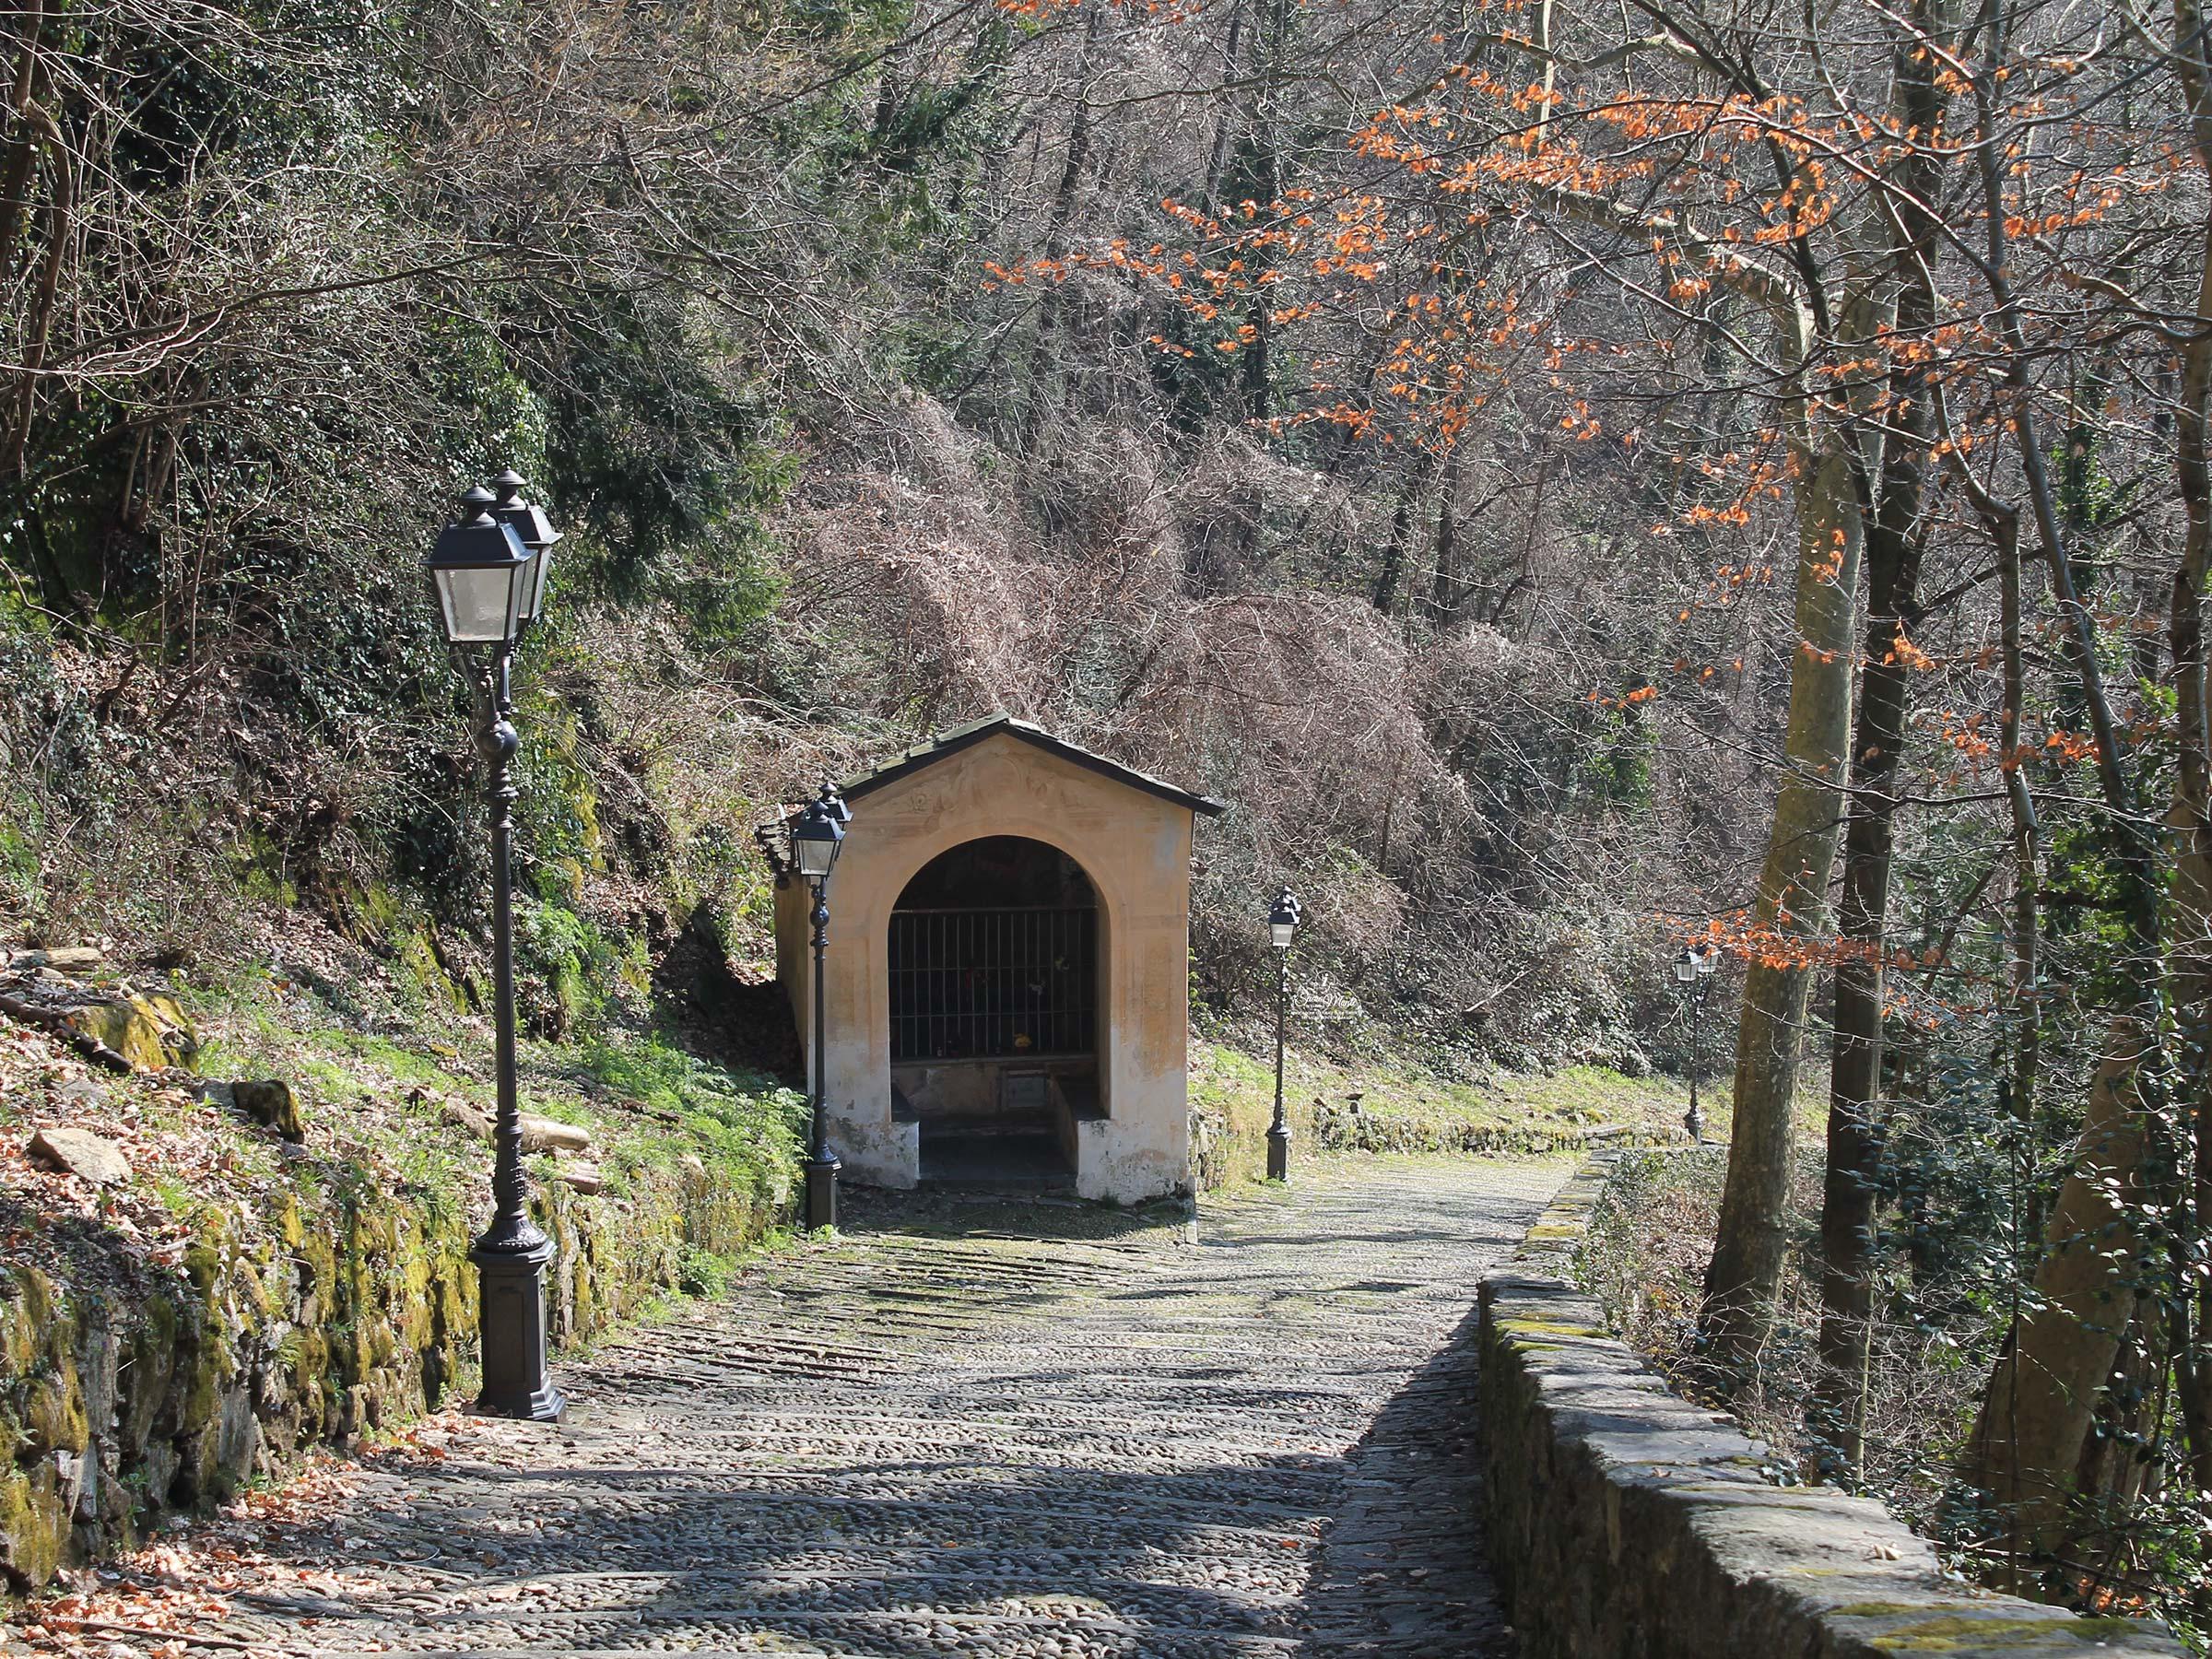 Sacro Monte di Varallo salita pedonale